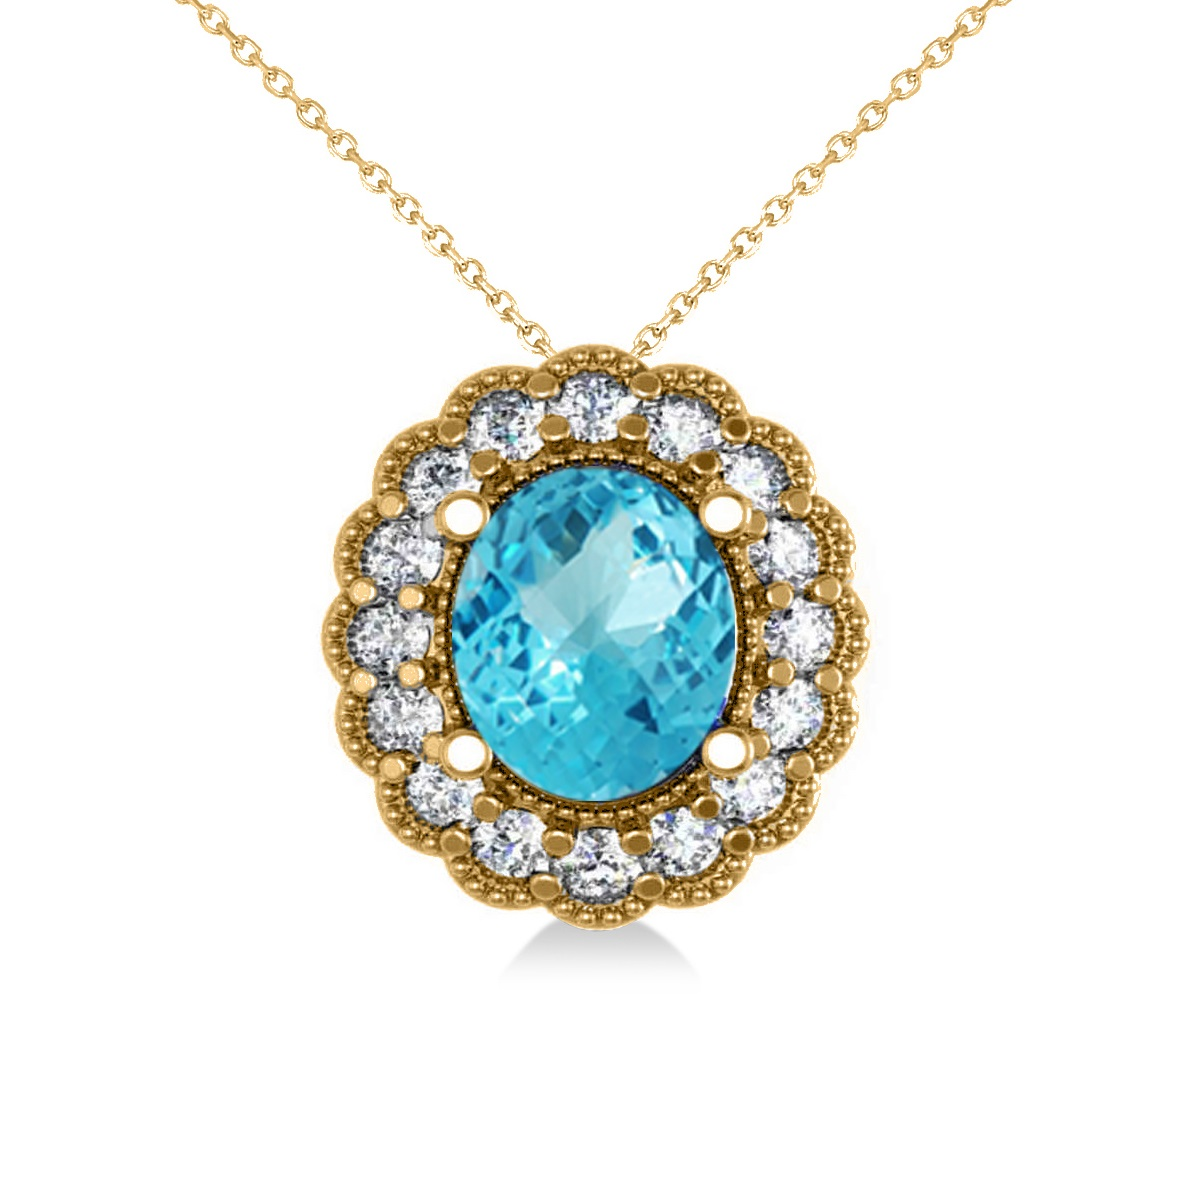 Blue Topaz & Diamond Floral Oval Pendant Necklace 14k Yellow Gold (2.98ct)